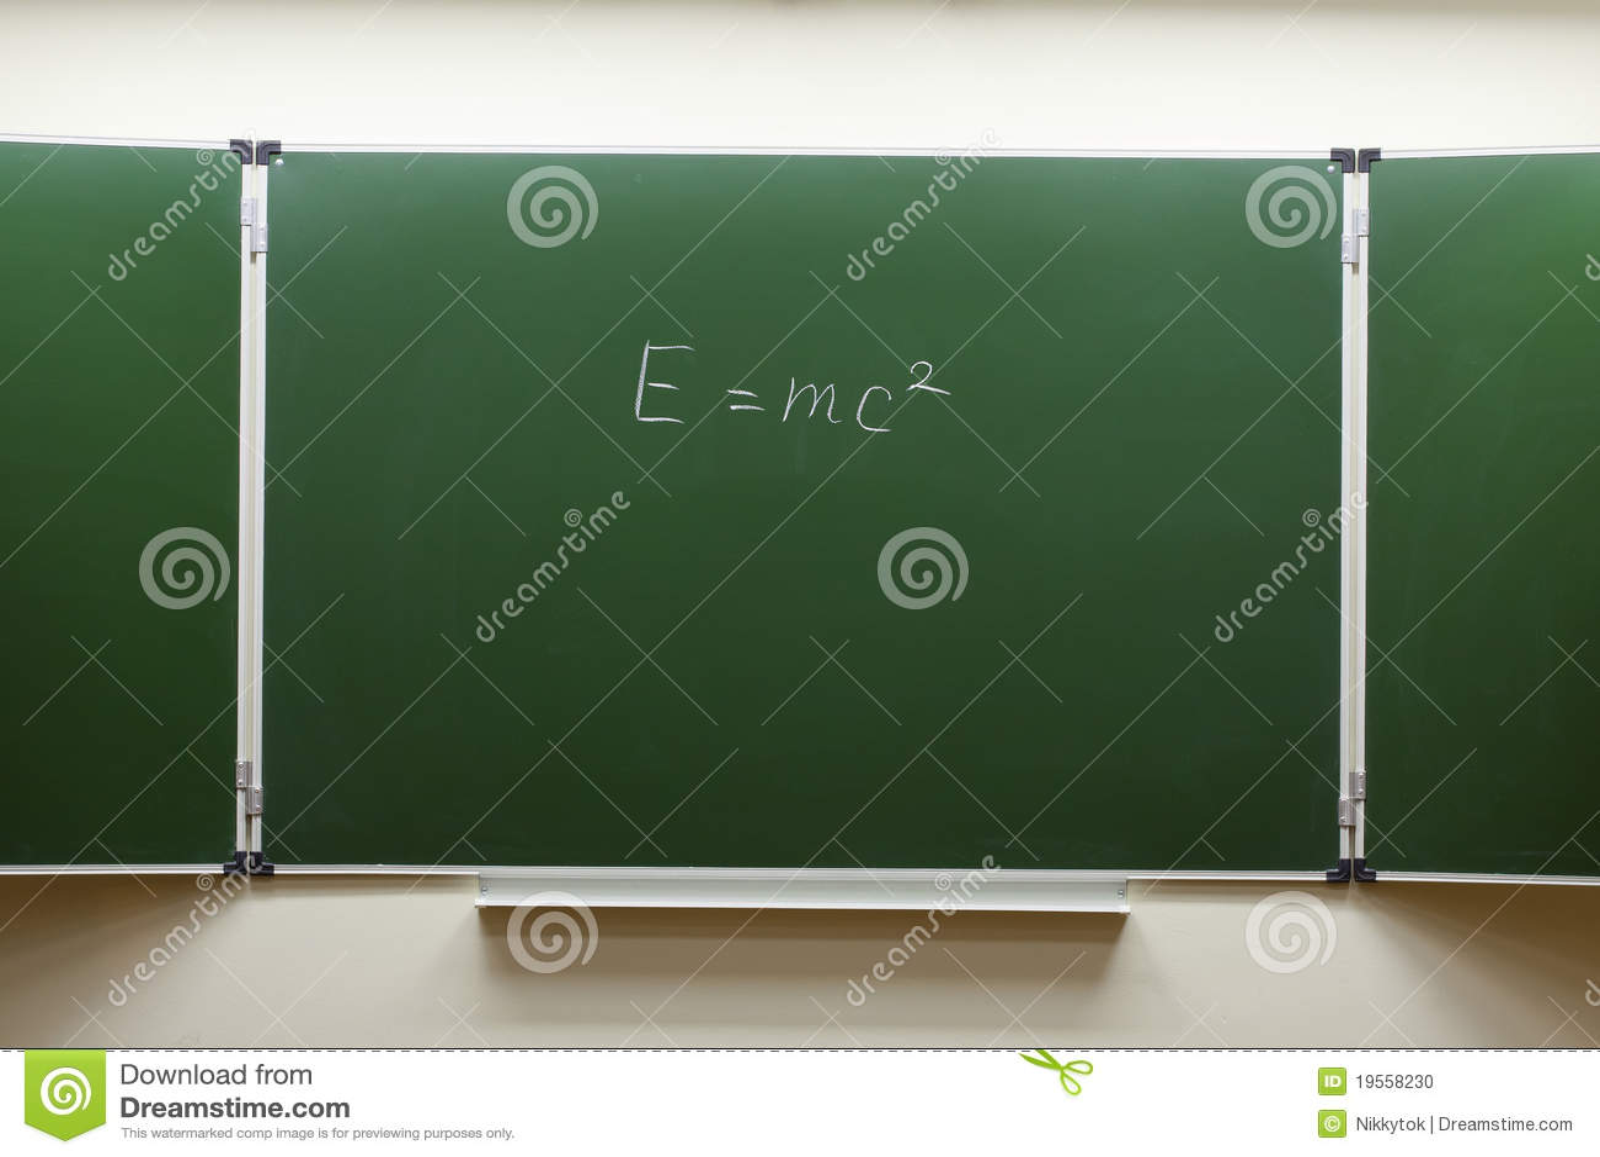 Blackboard Innovative Classroom ~ Blackboard in the classroom stock photo image